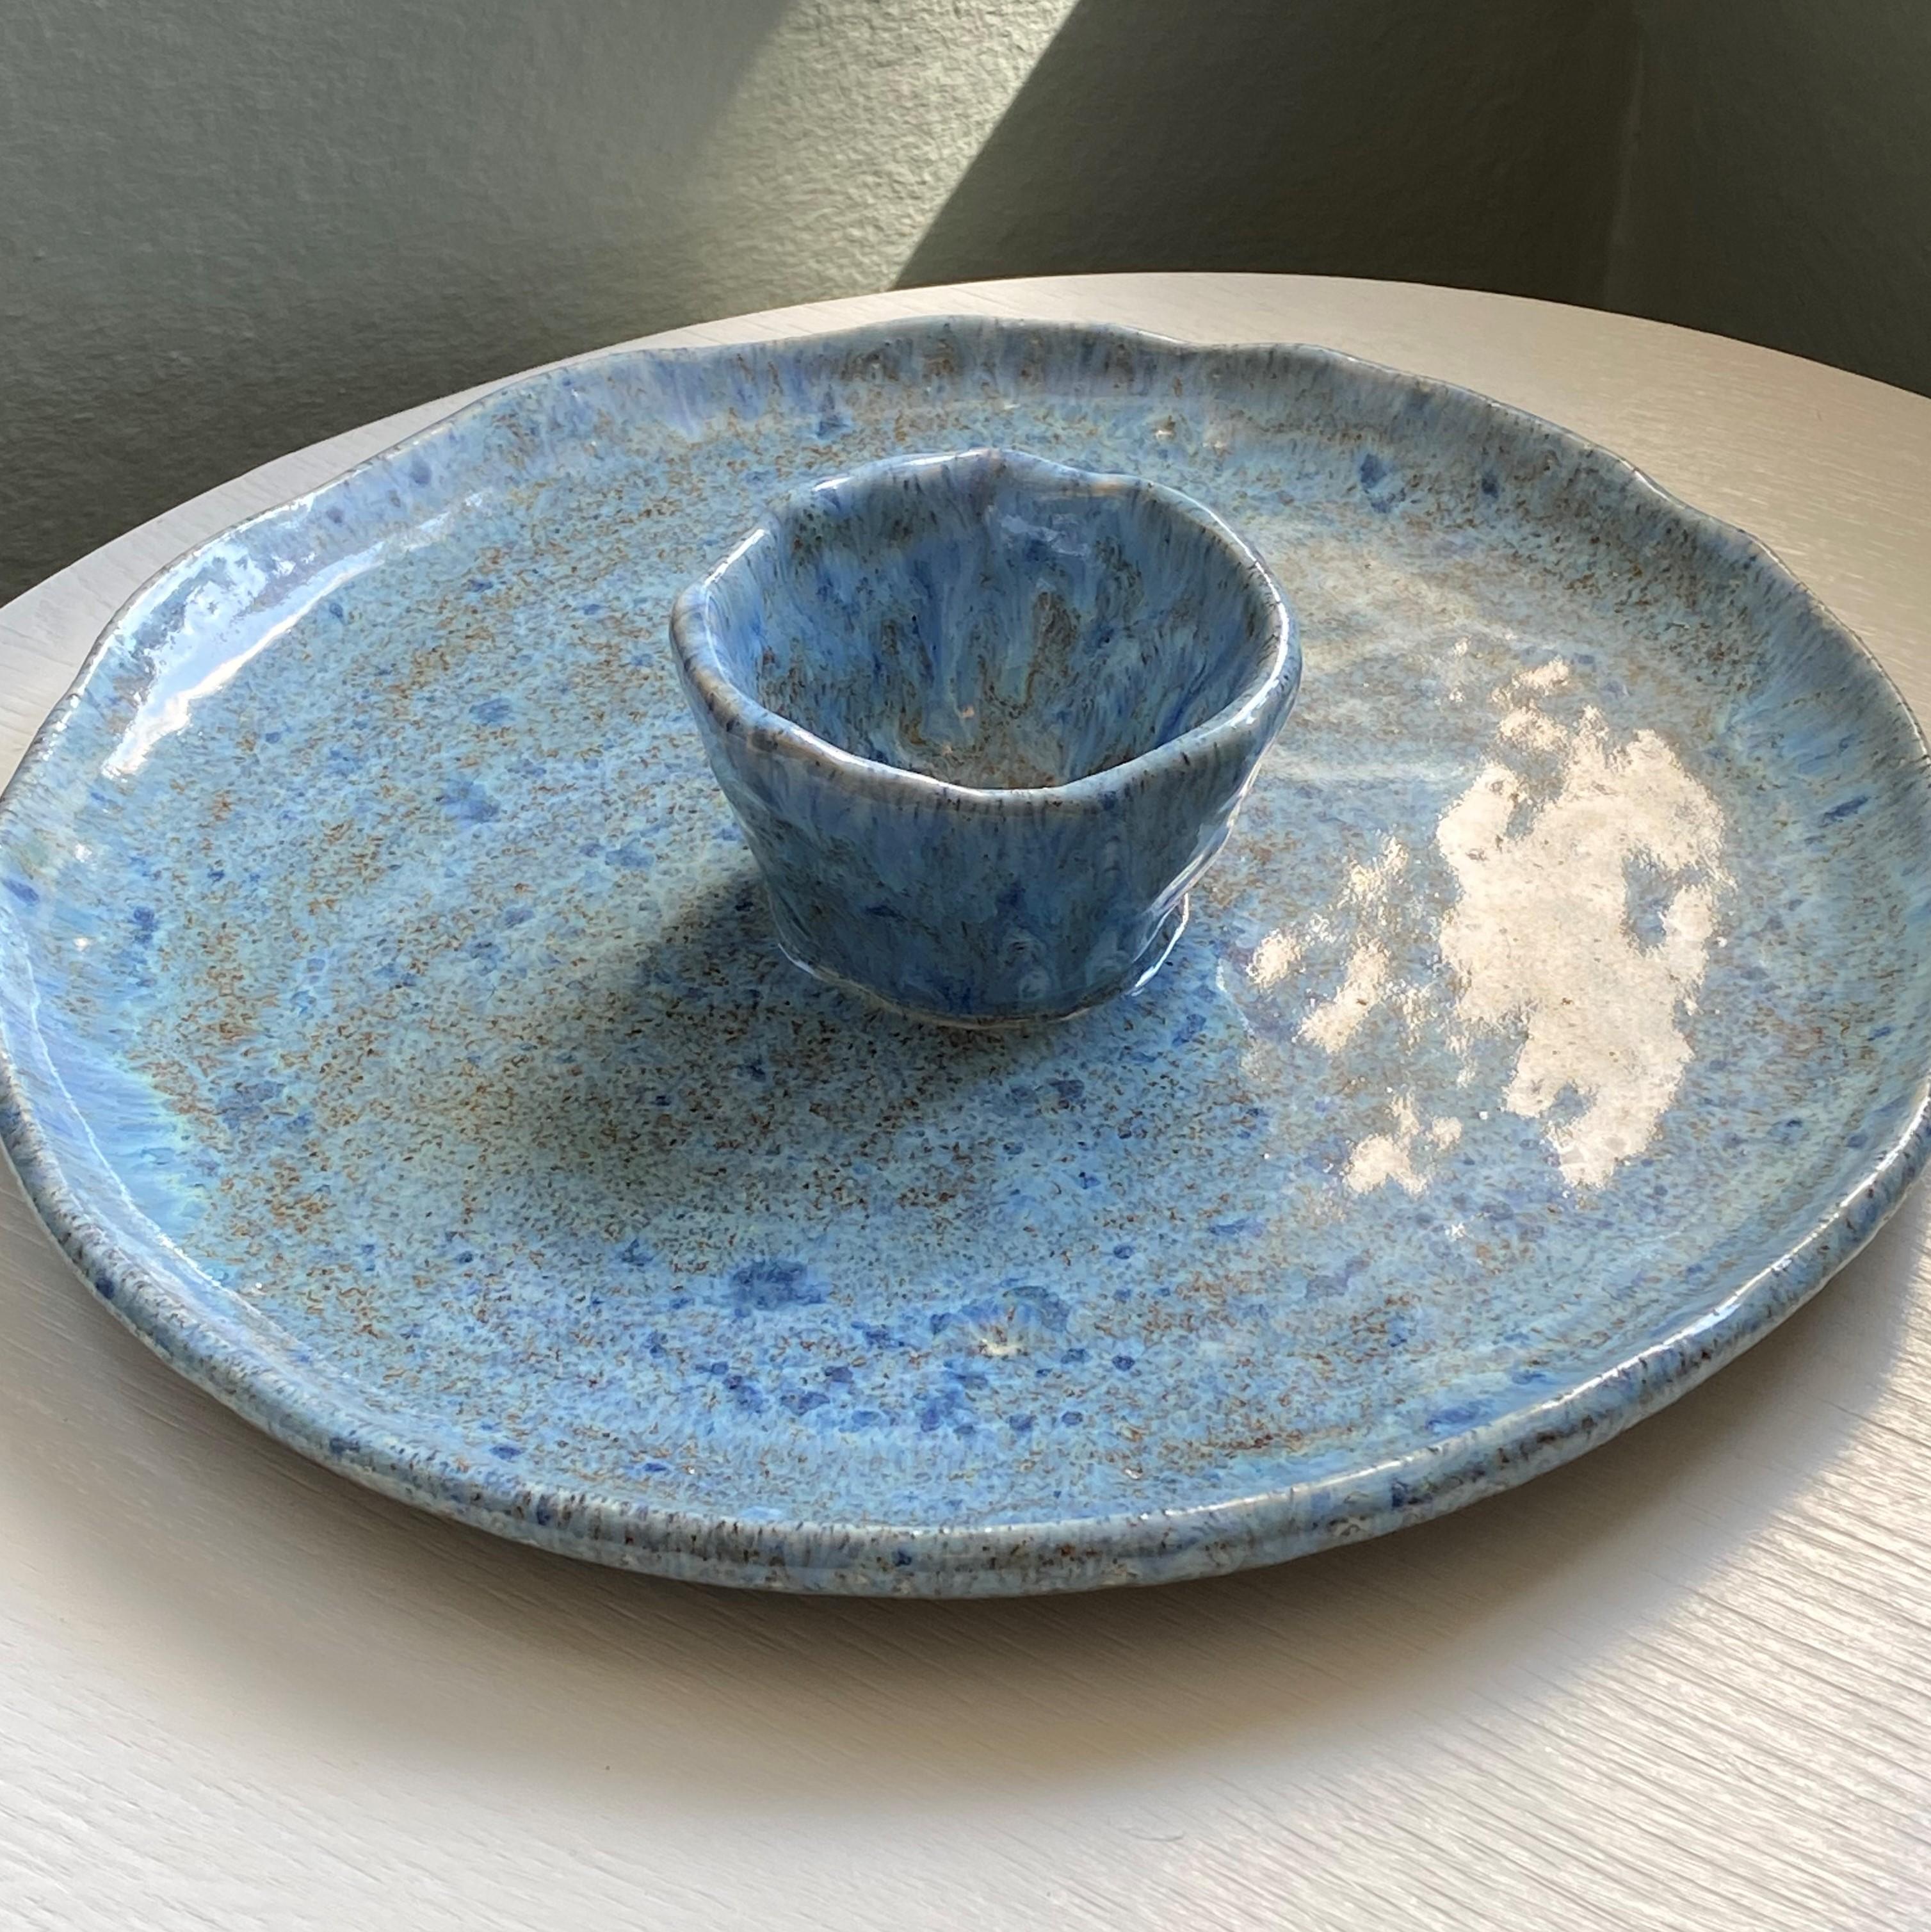 Unika fad i keramik, 2